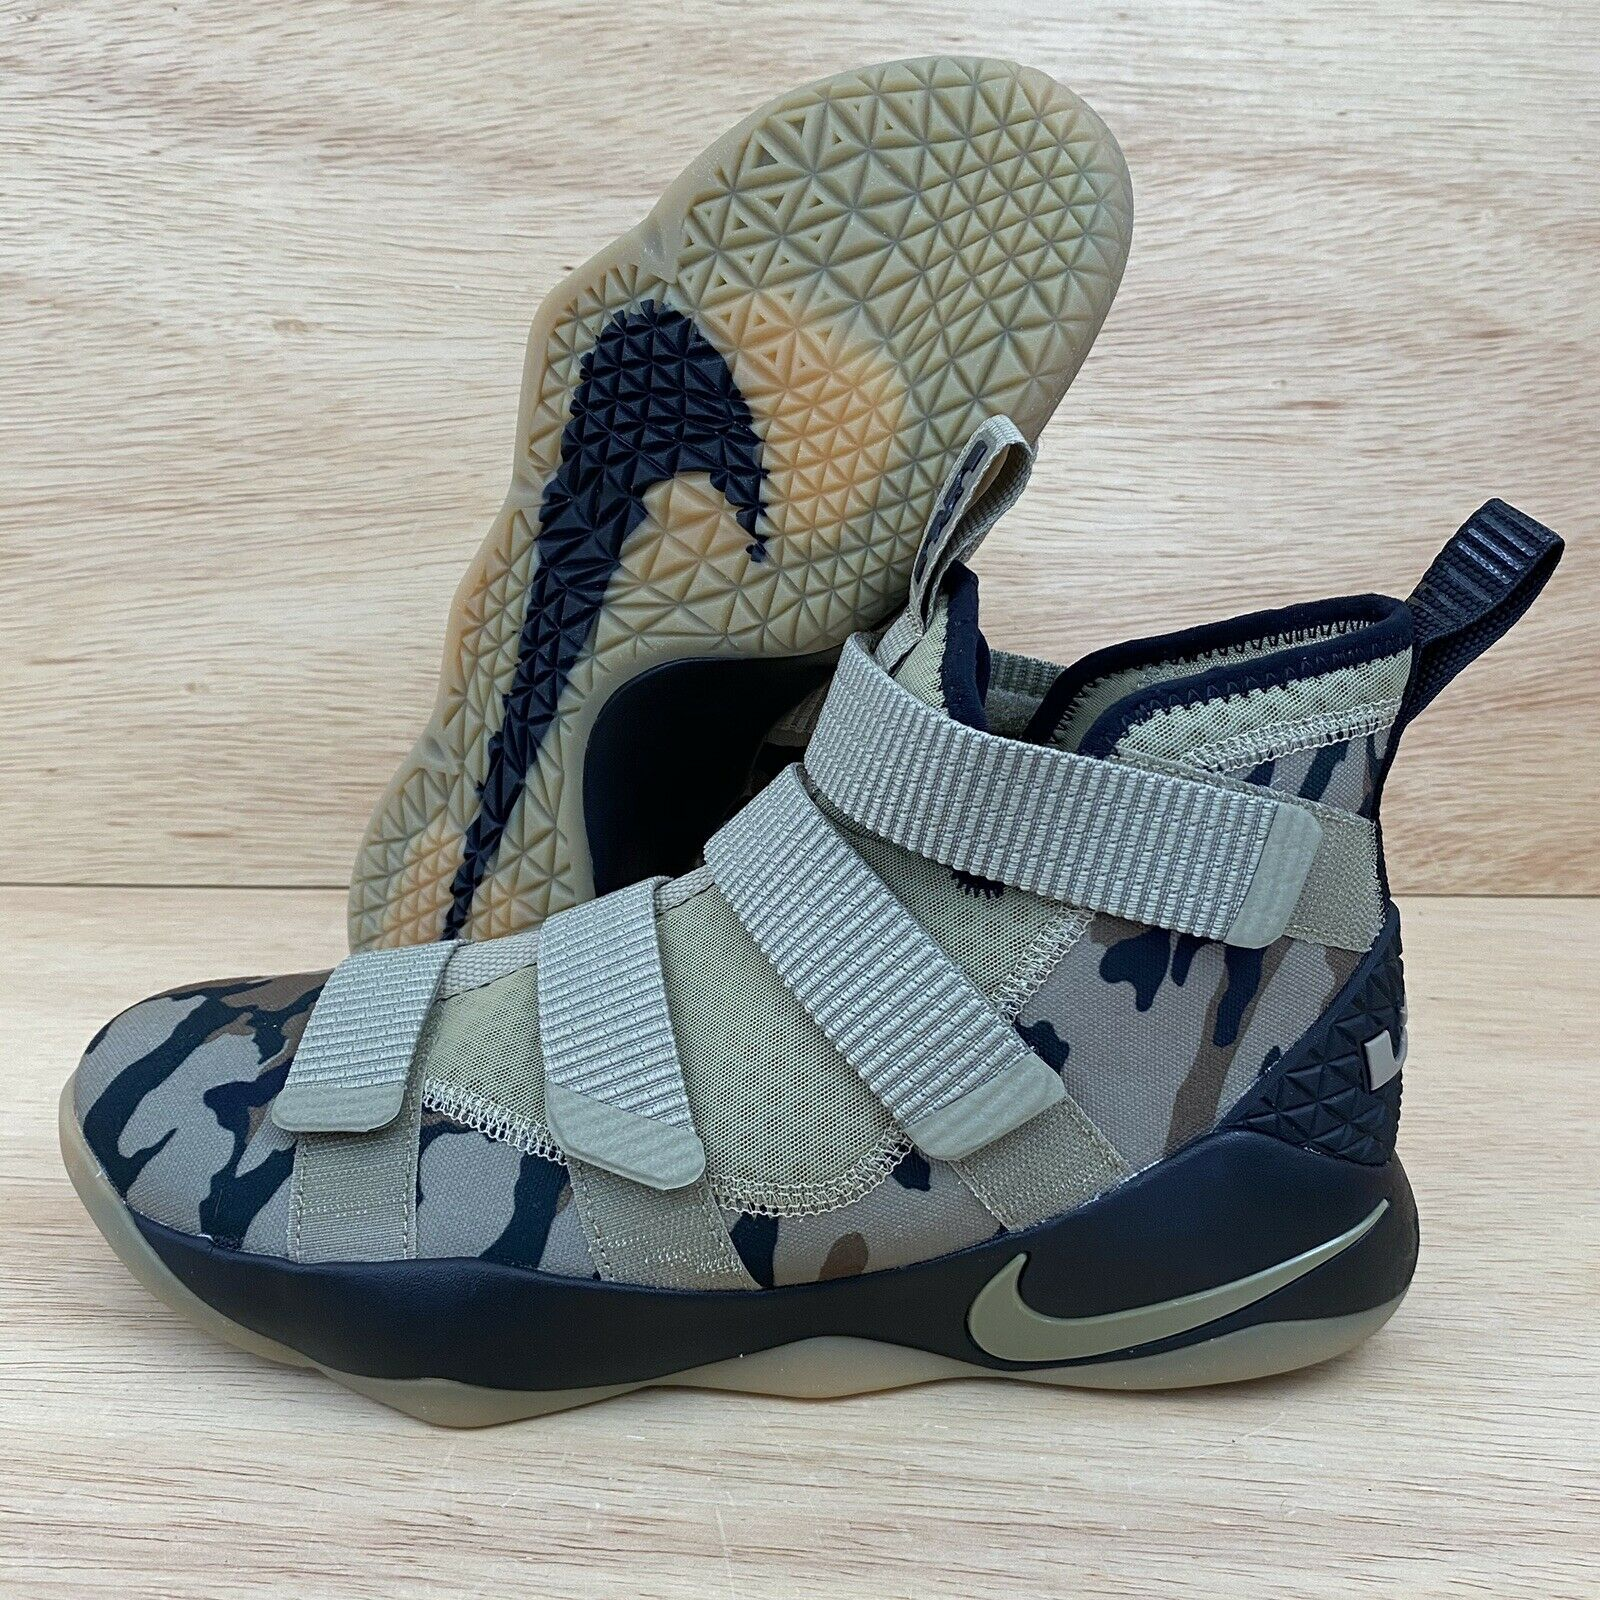 Nike Lebron Soldier XI Mens Basketball